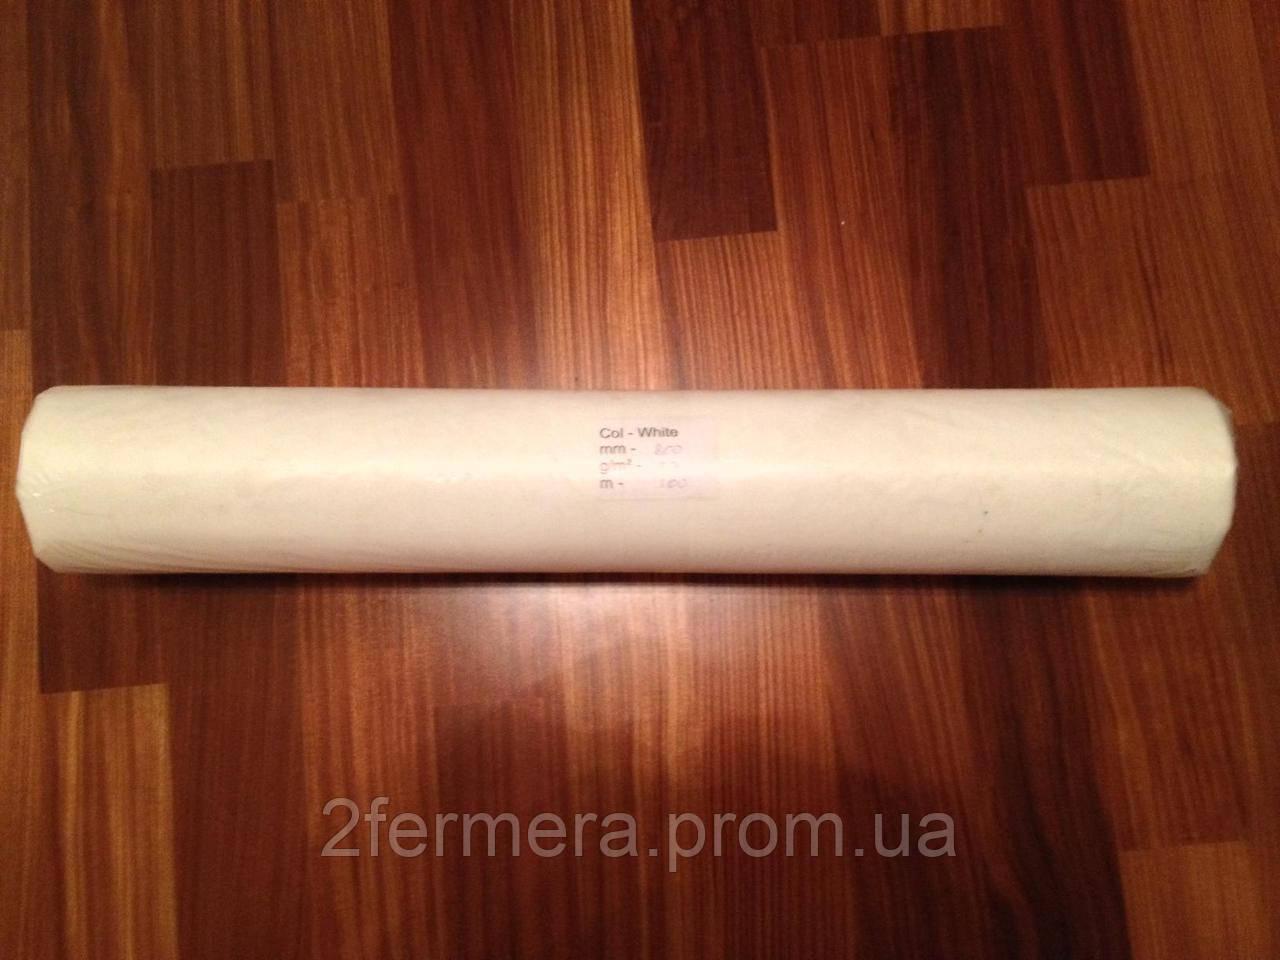 Простынь одноразовая 21гр 0.8*100м. белая new